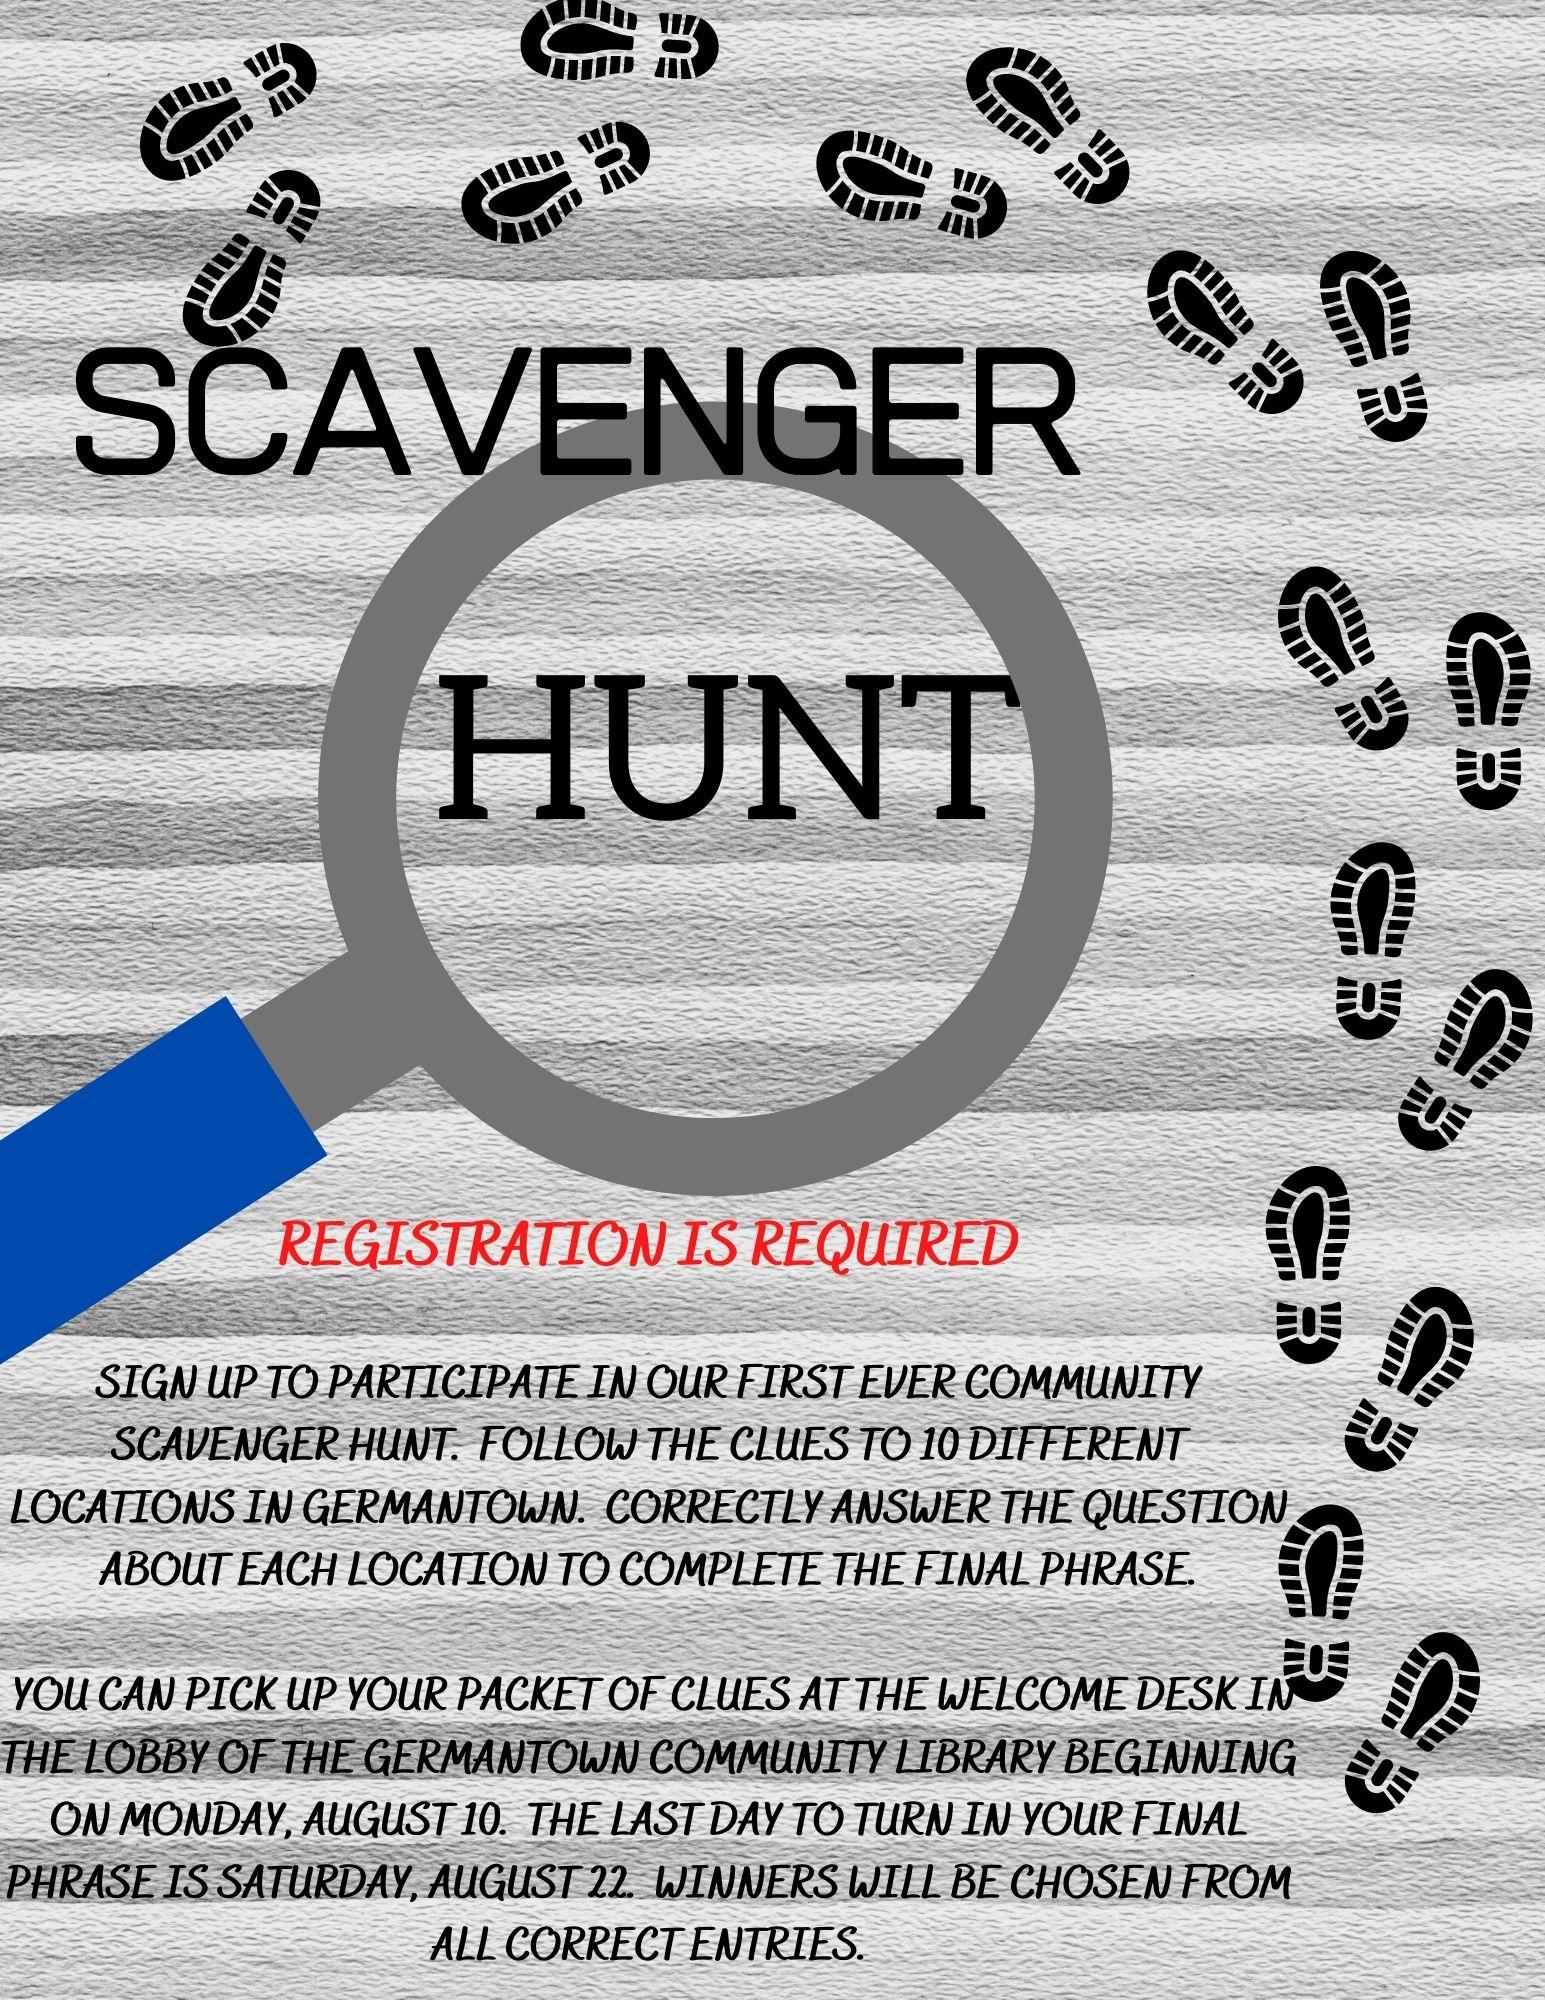 The Great Germantown Race - Community Scavenger Hunt